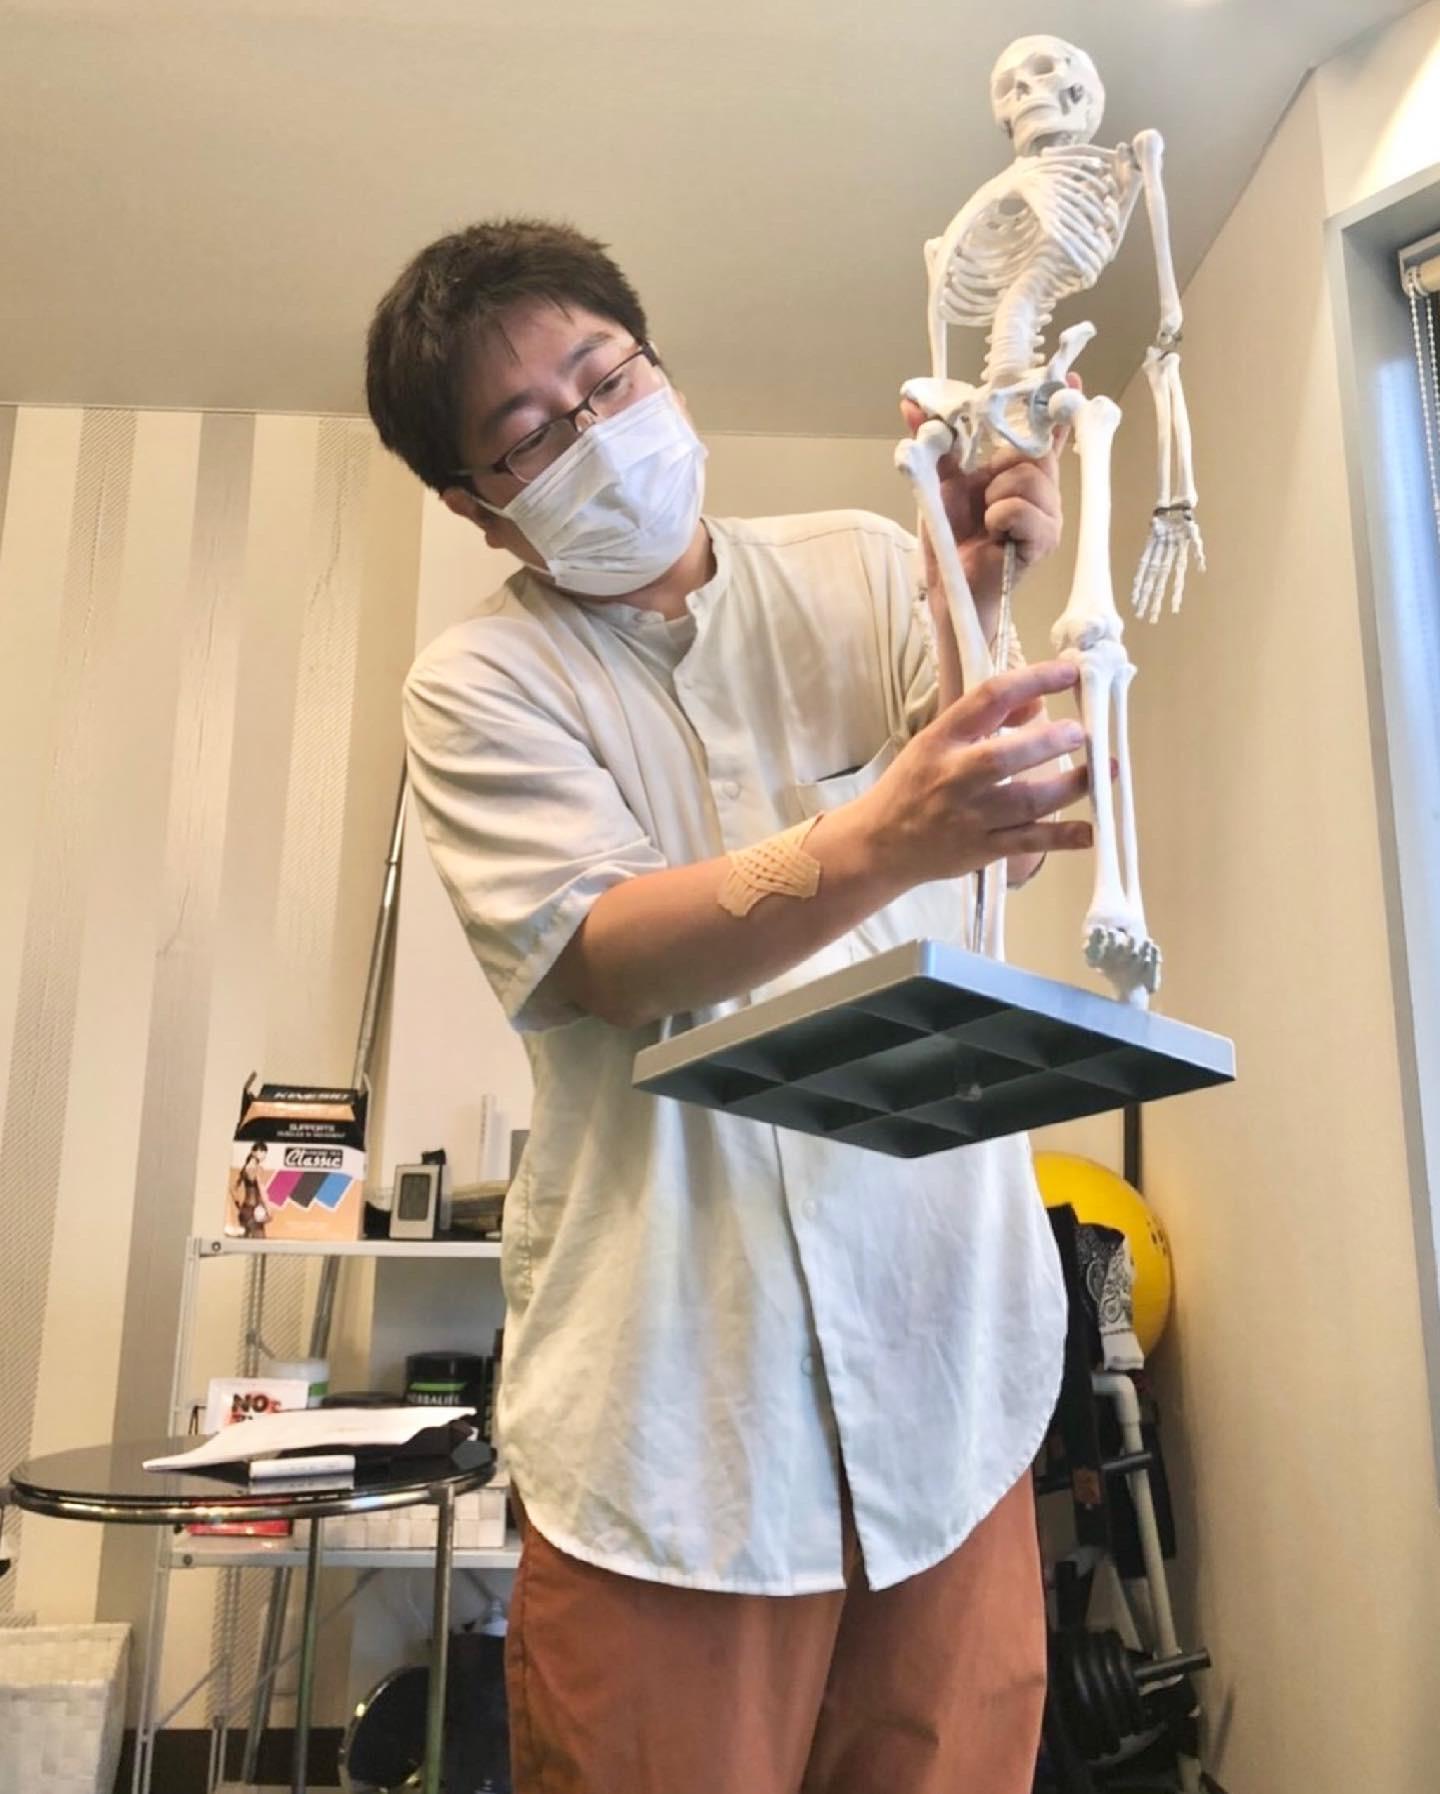 社内勉強会【腰の痛み/梅雨/体調不良】